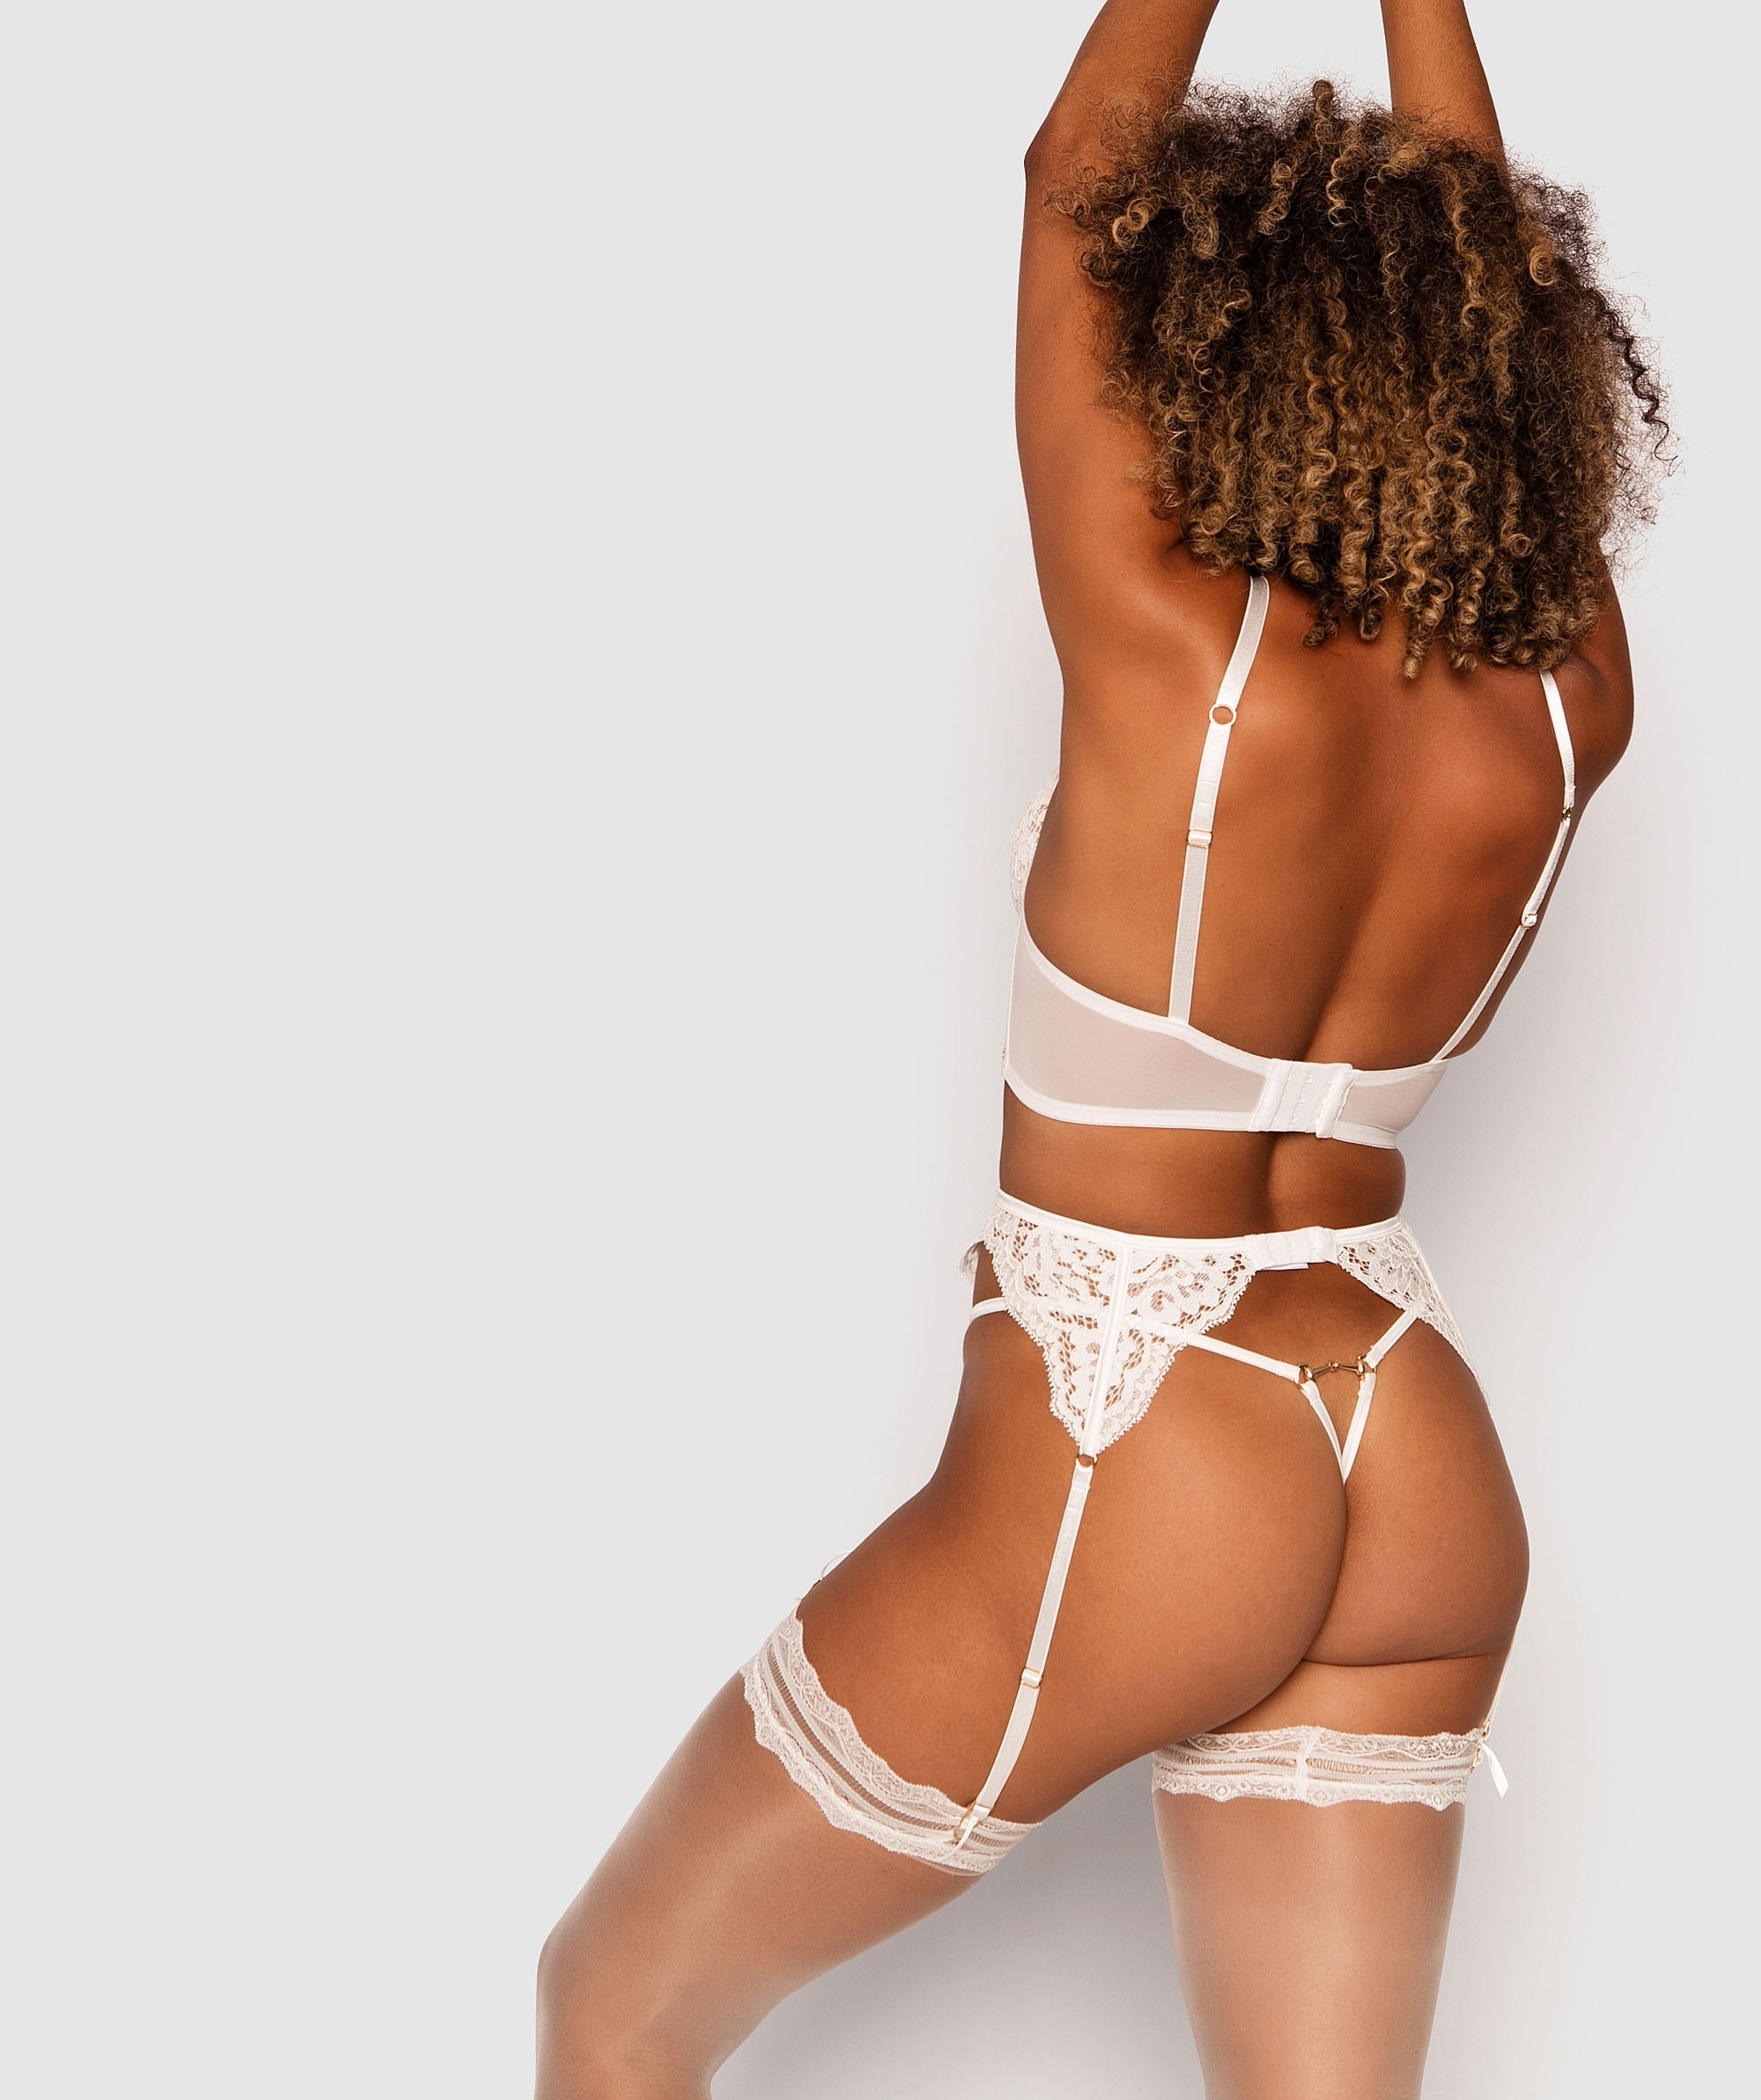 Vamp Muse Suspender - White